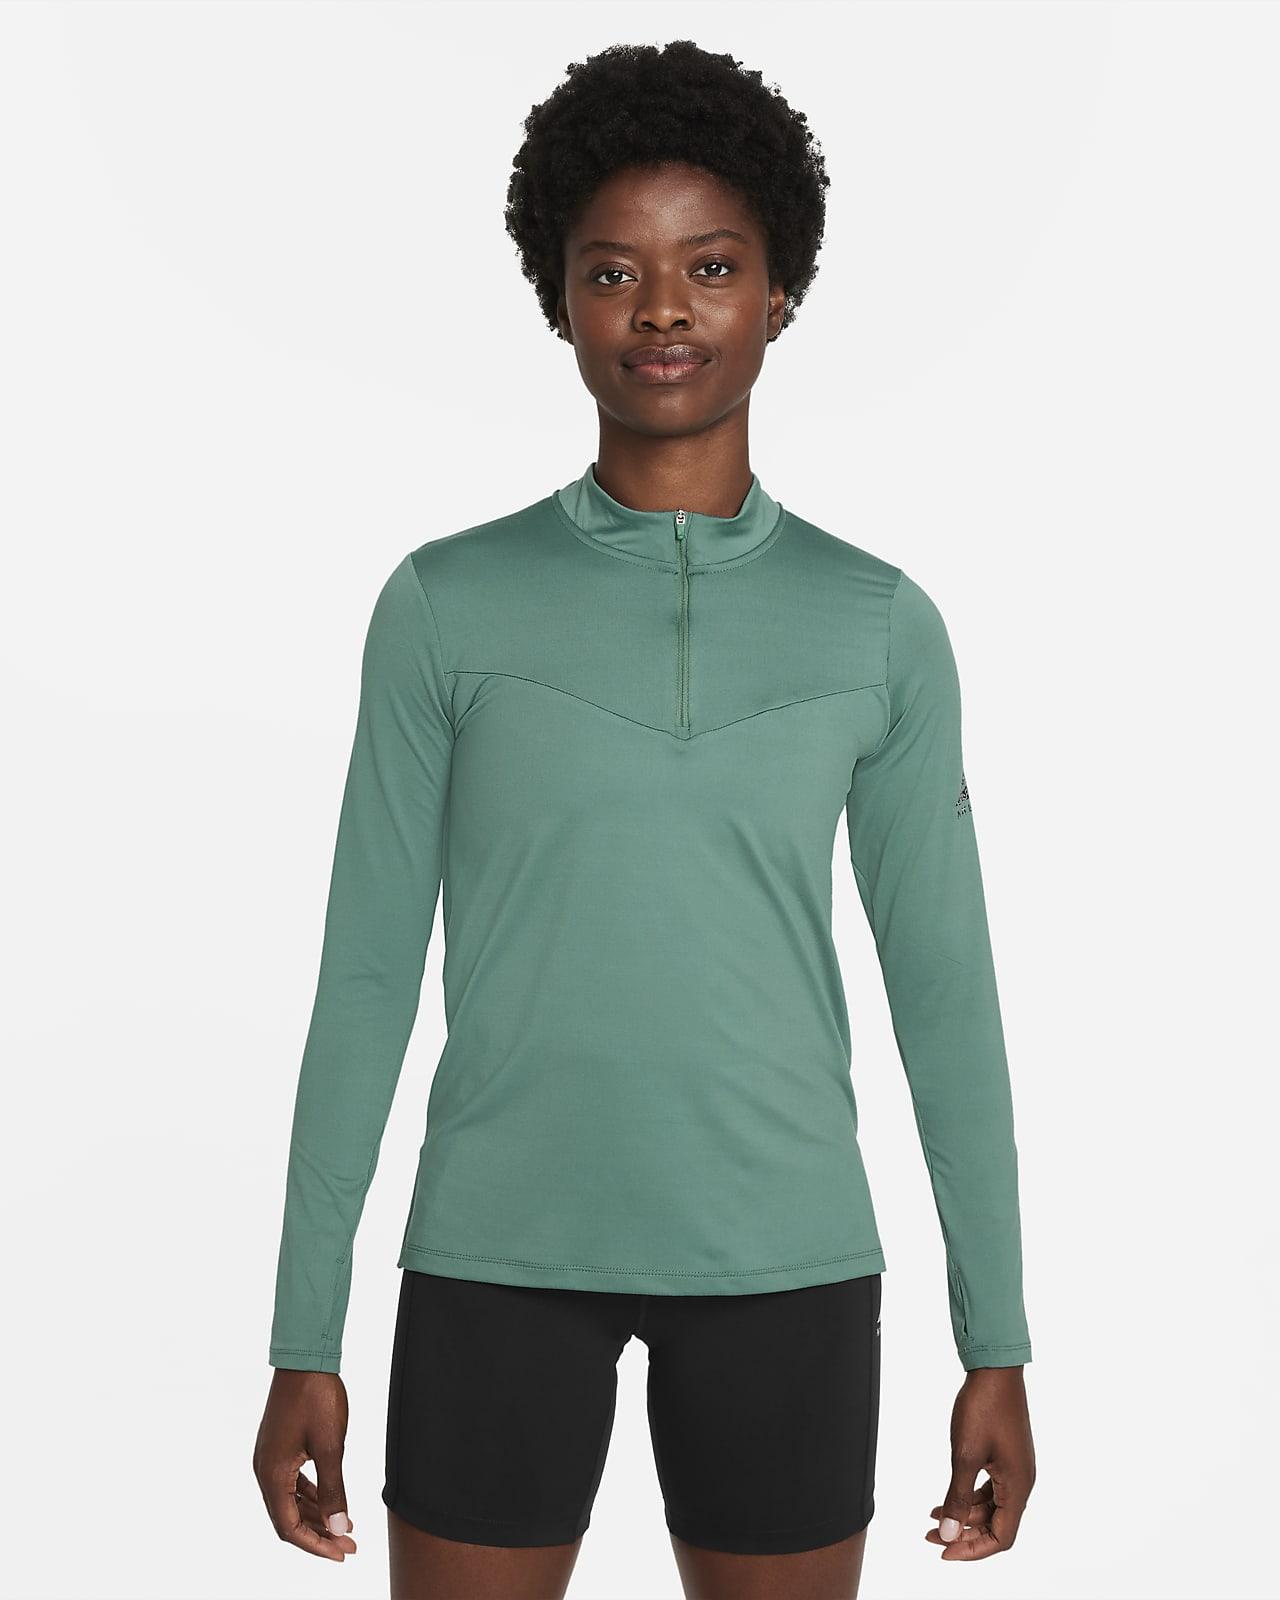 Nike Tussenlaag voor trailrunning voor dames